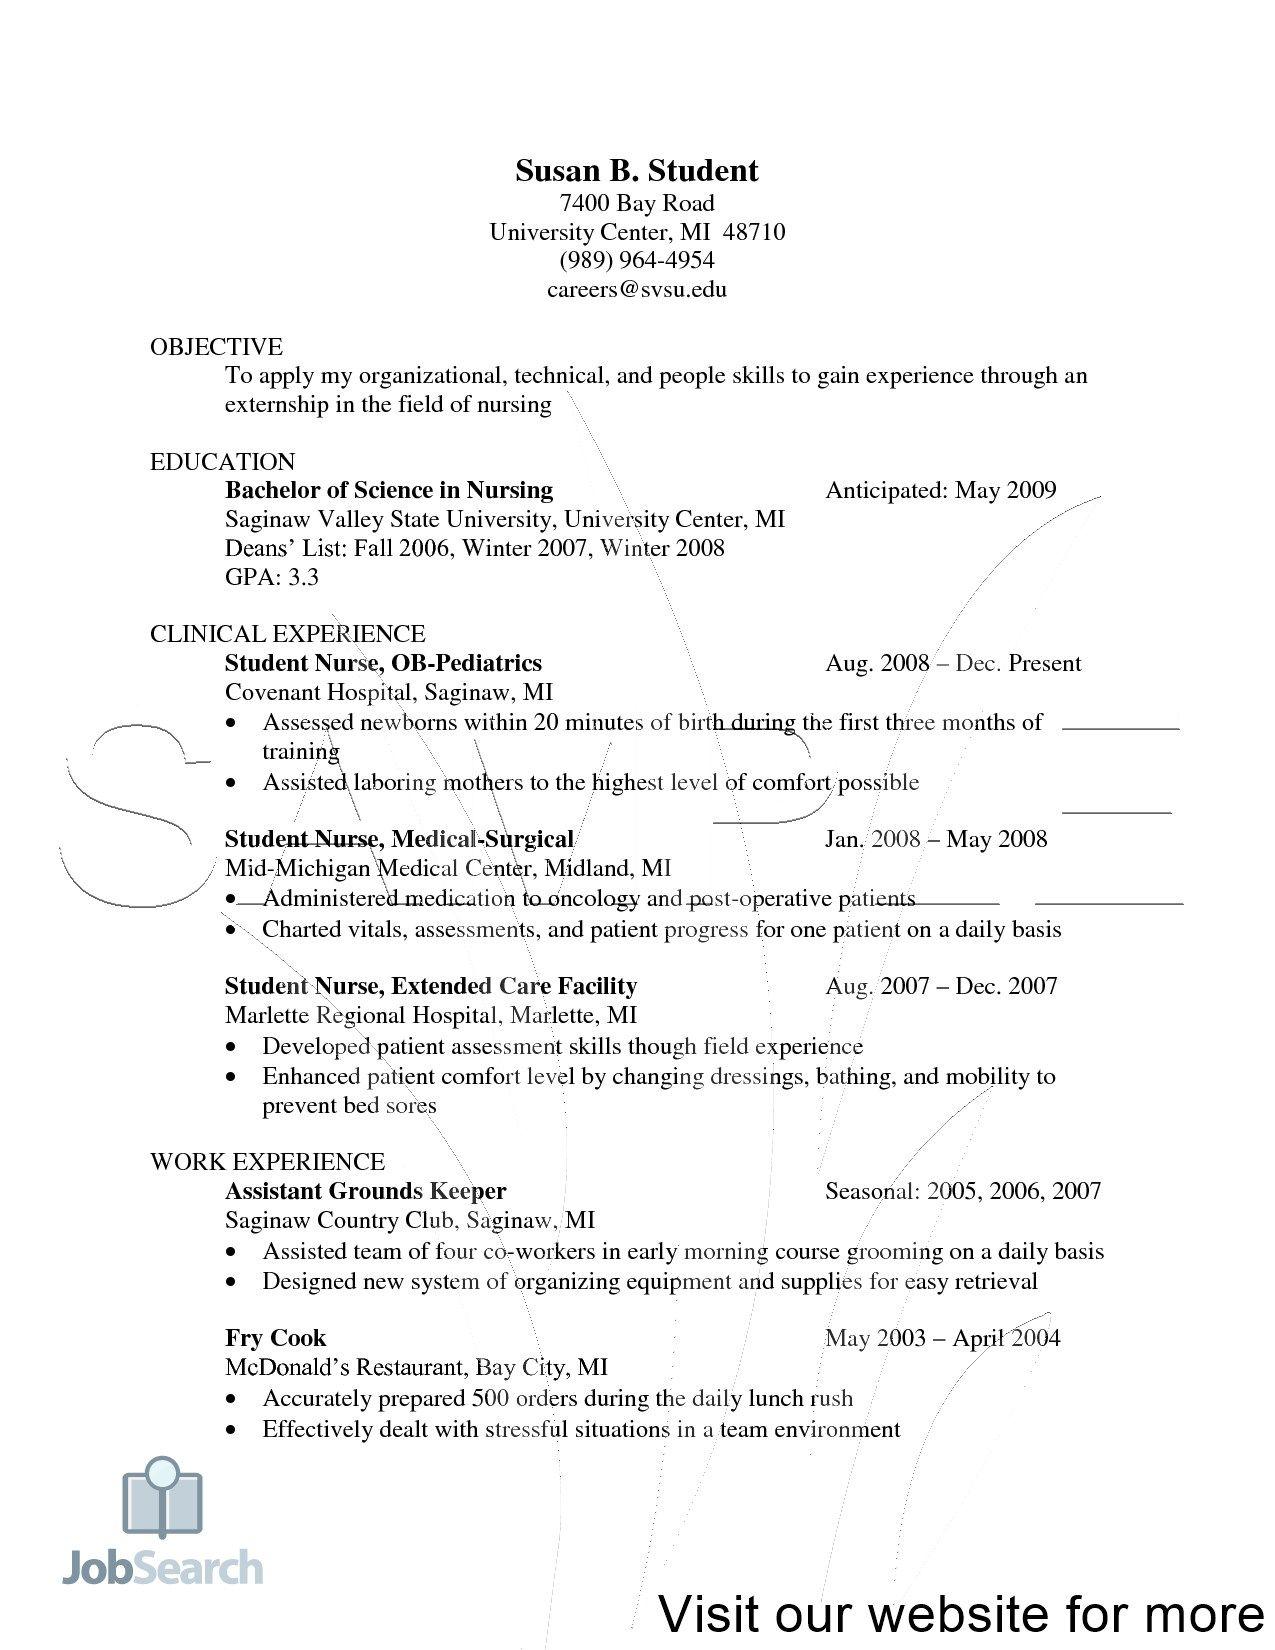 resume design template free in 2020 Resume design